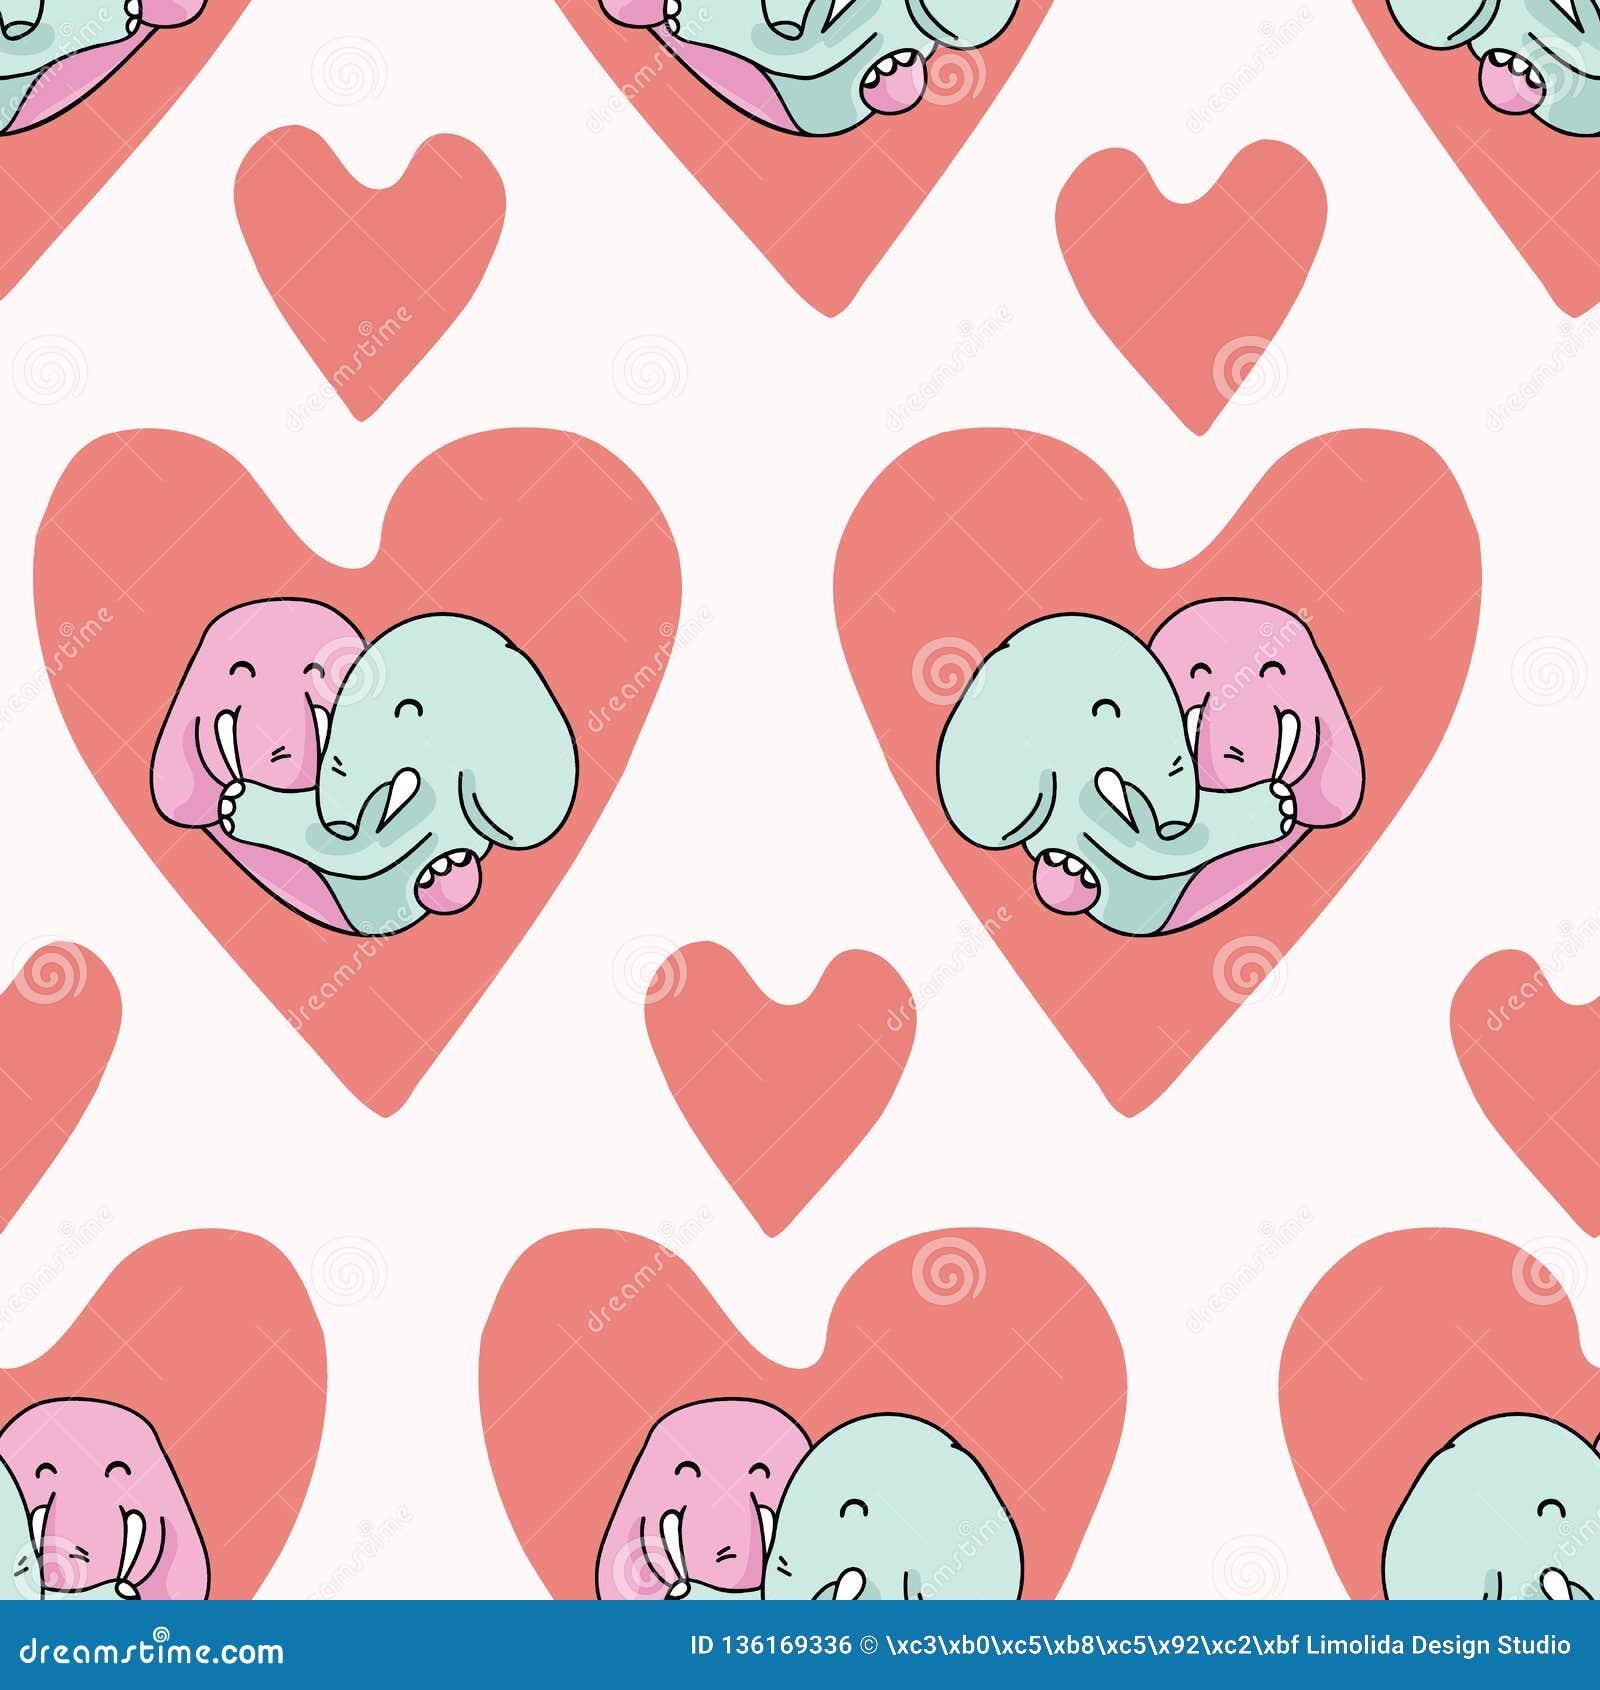 Vector cute elephant hug hearts Seamless repeat pattern